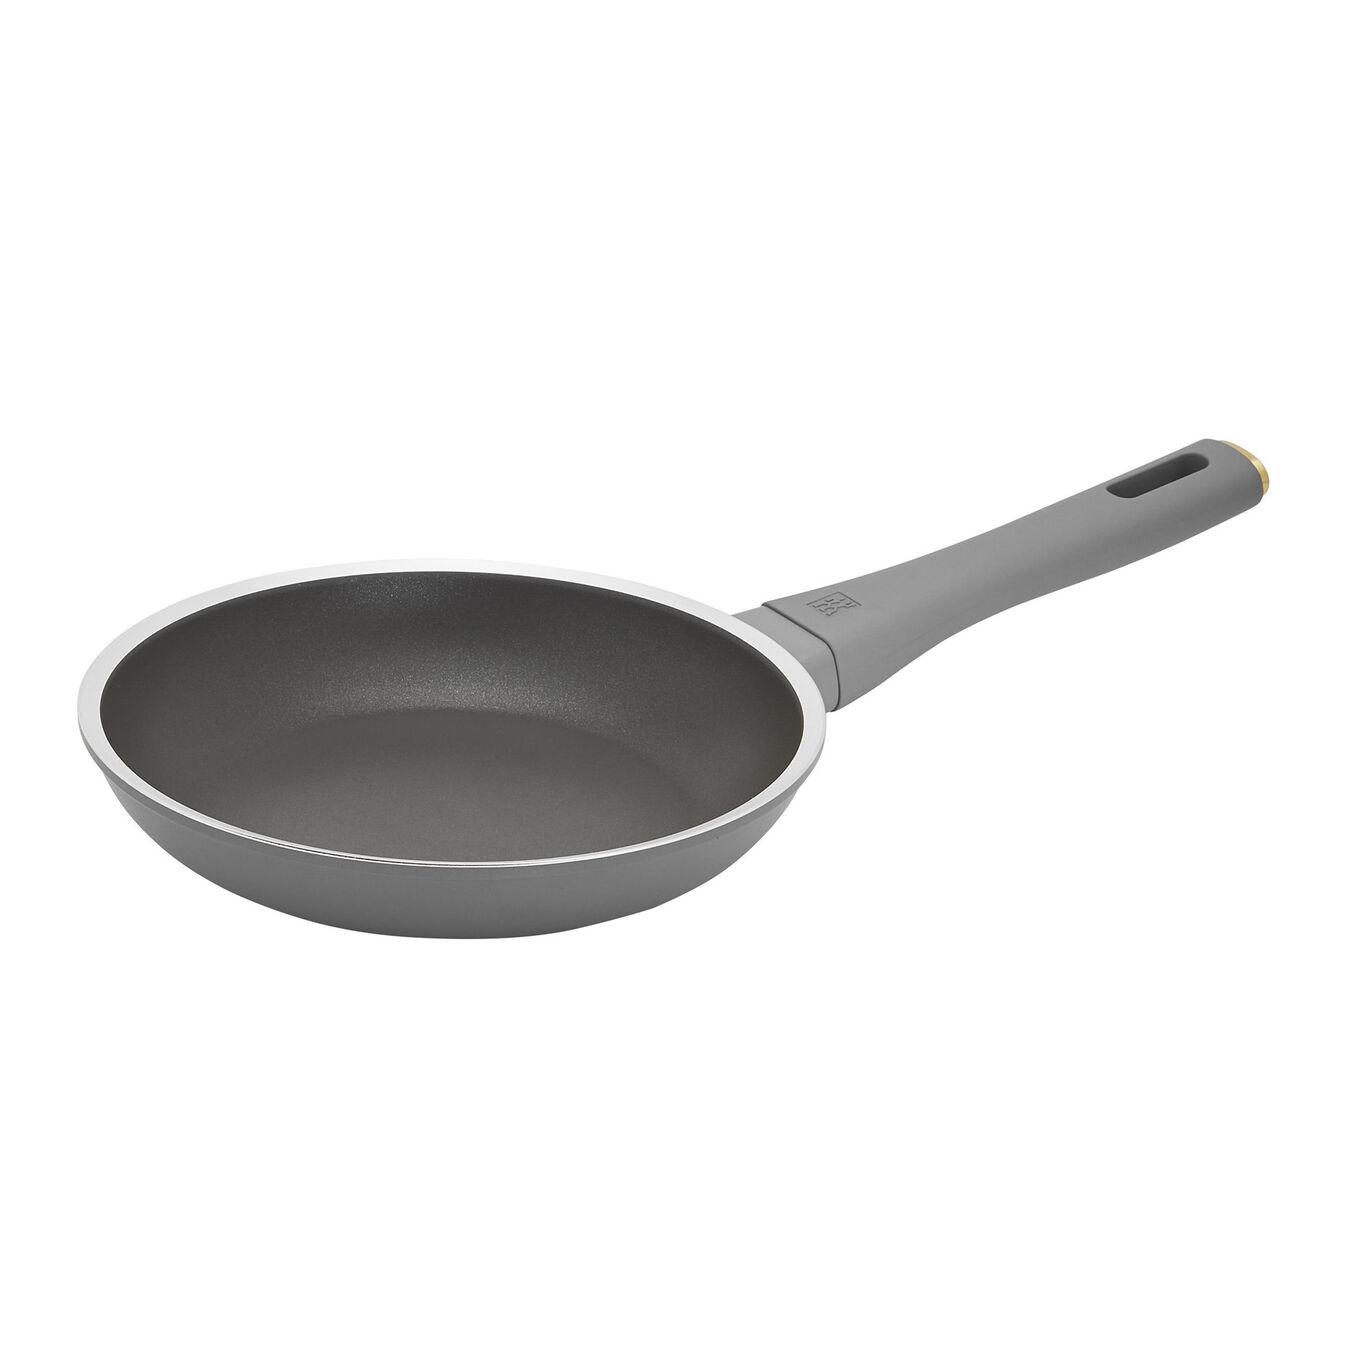 20 cm / 8 inch Frying pan,,large 1